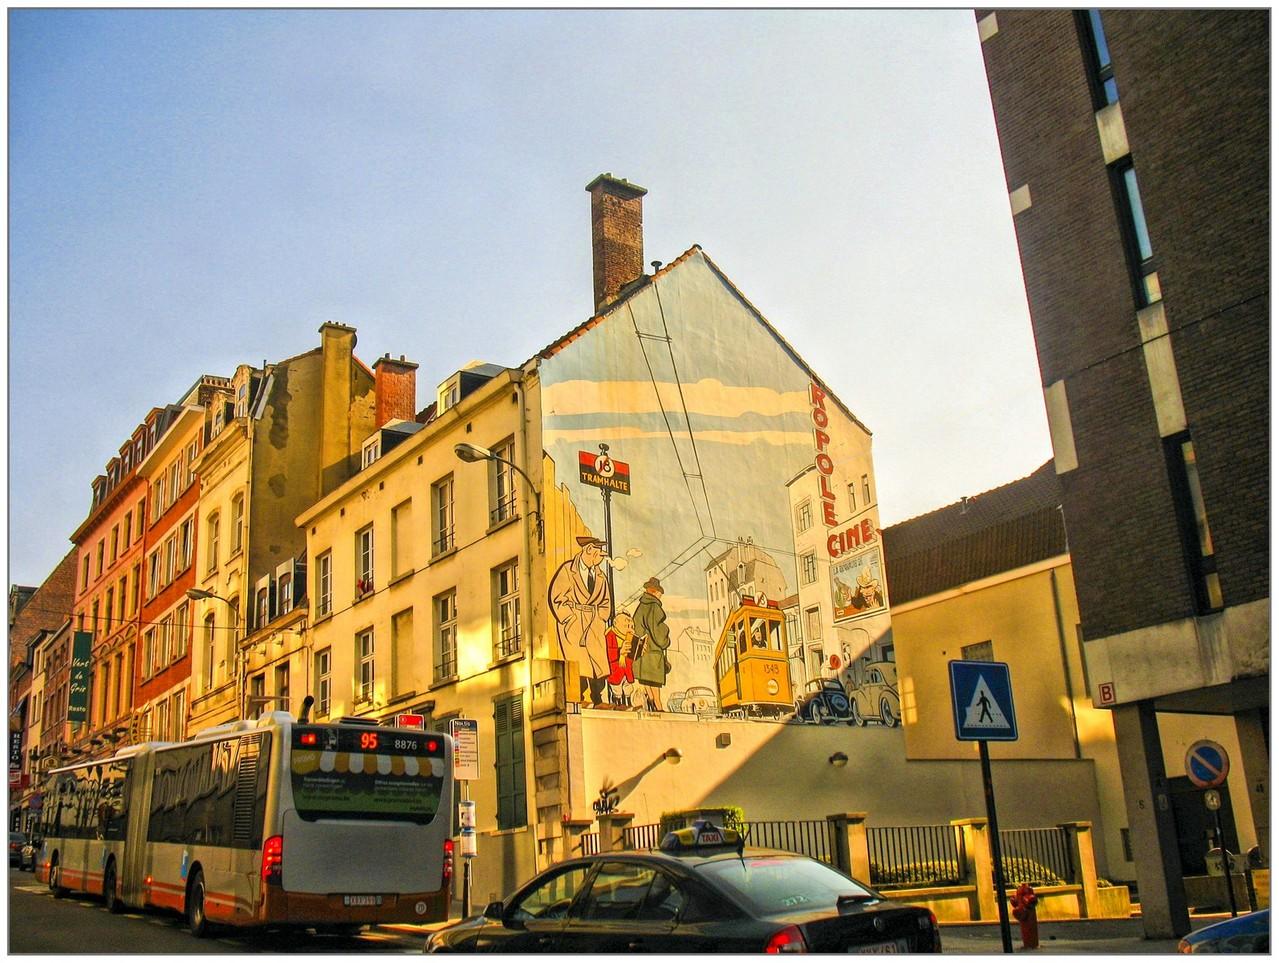 Mur de Bruxelles - Annie